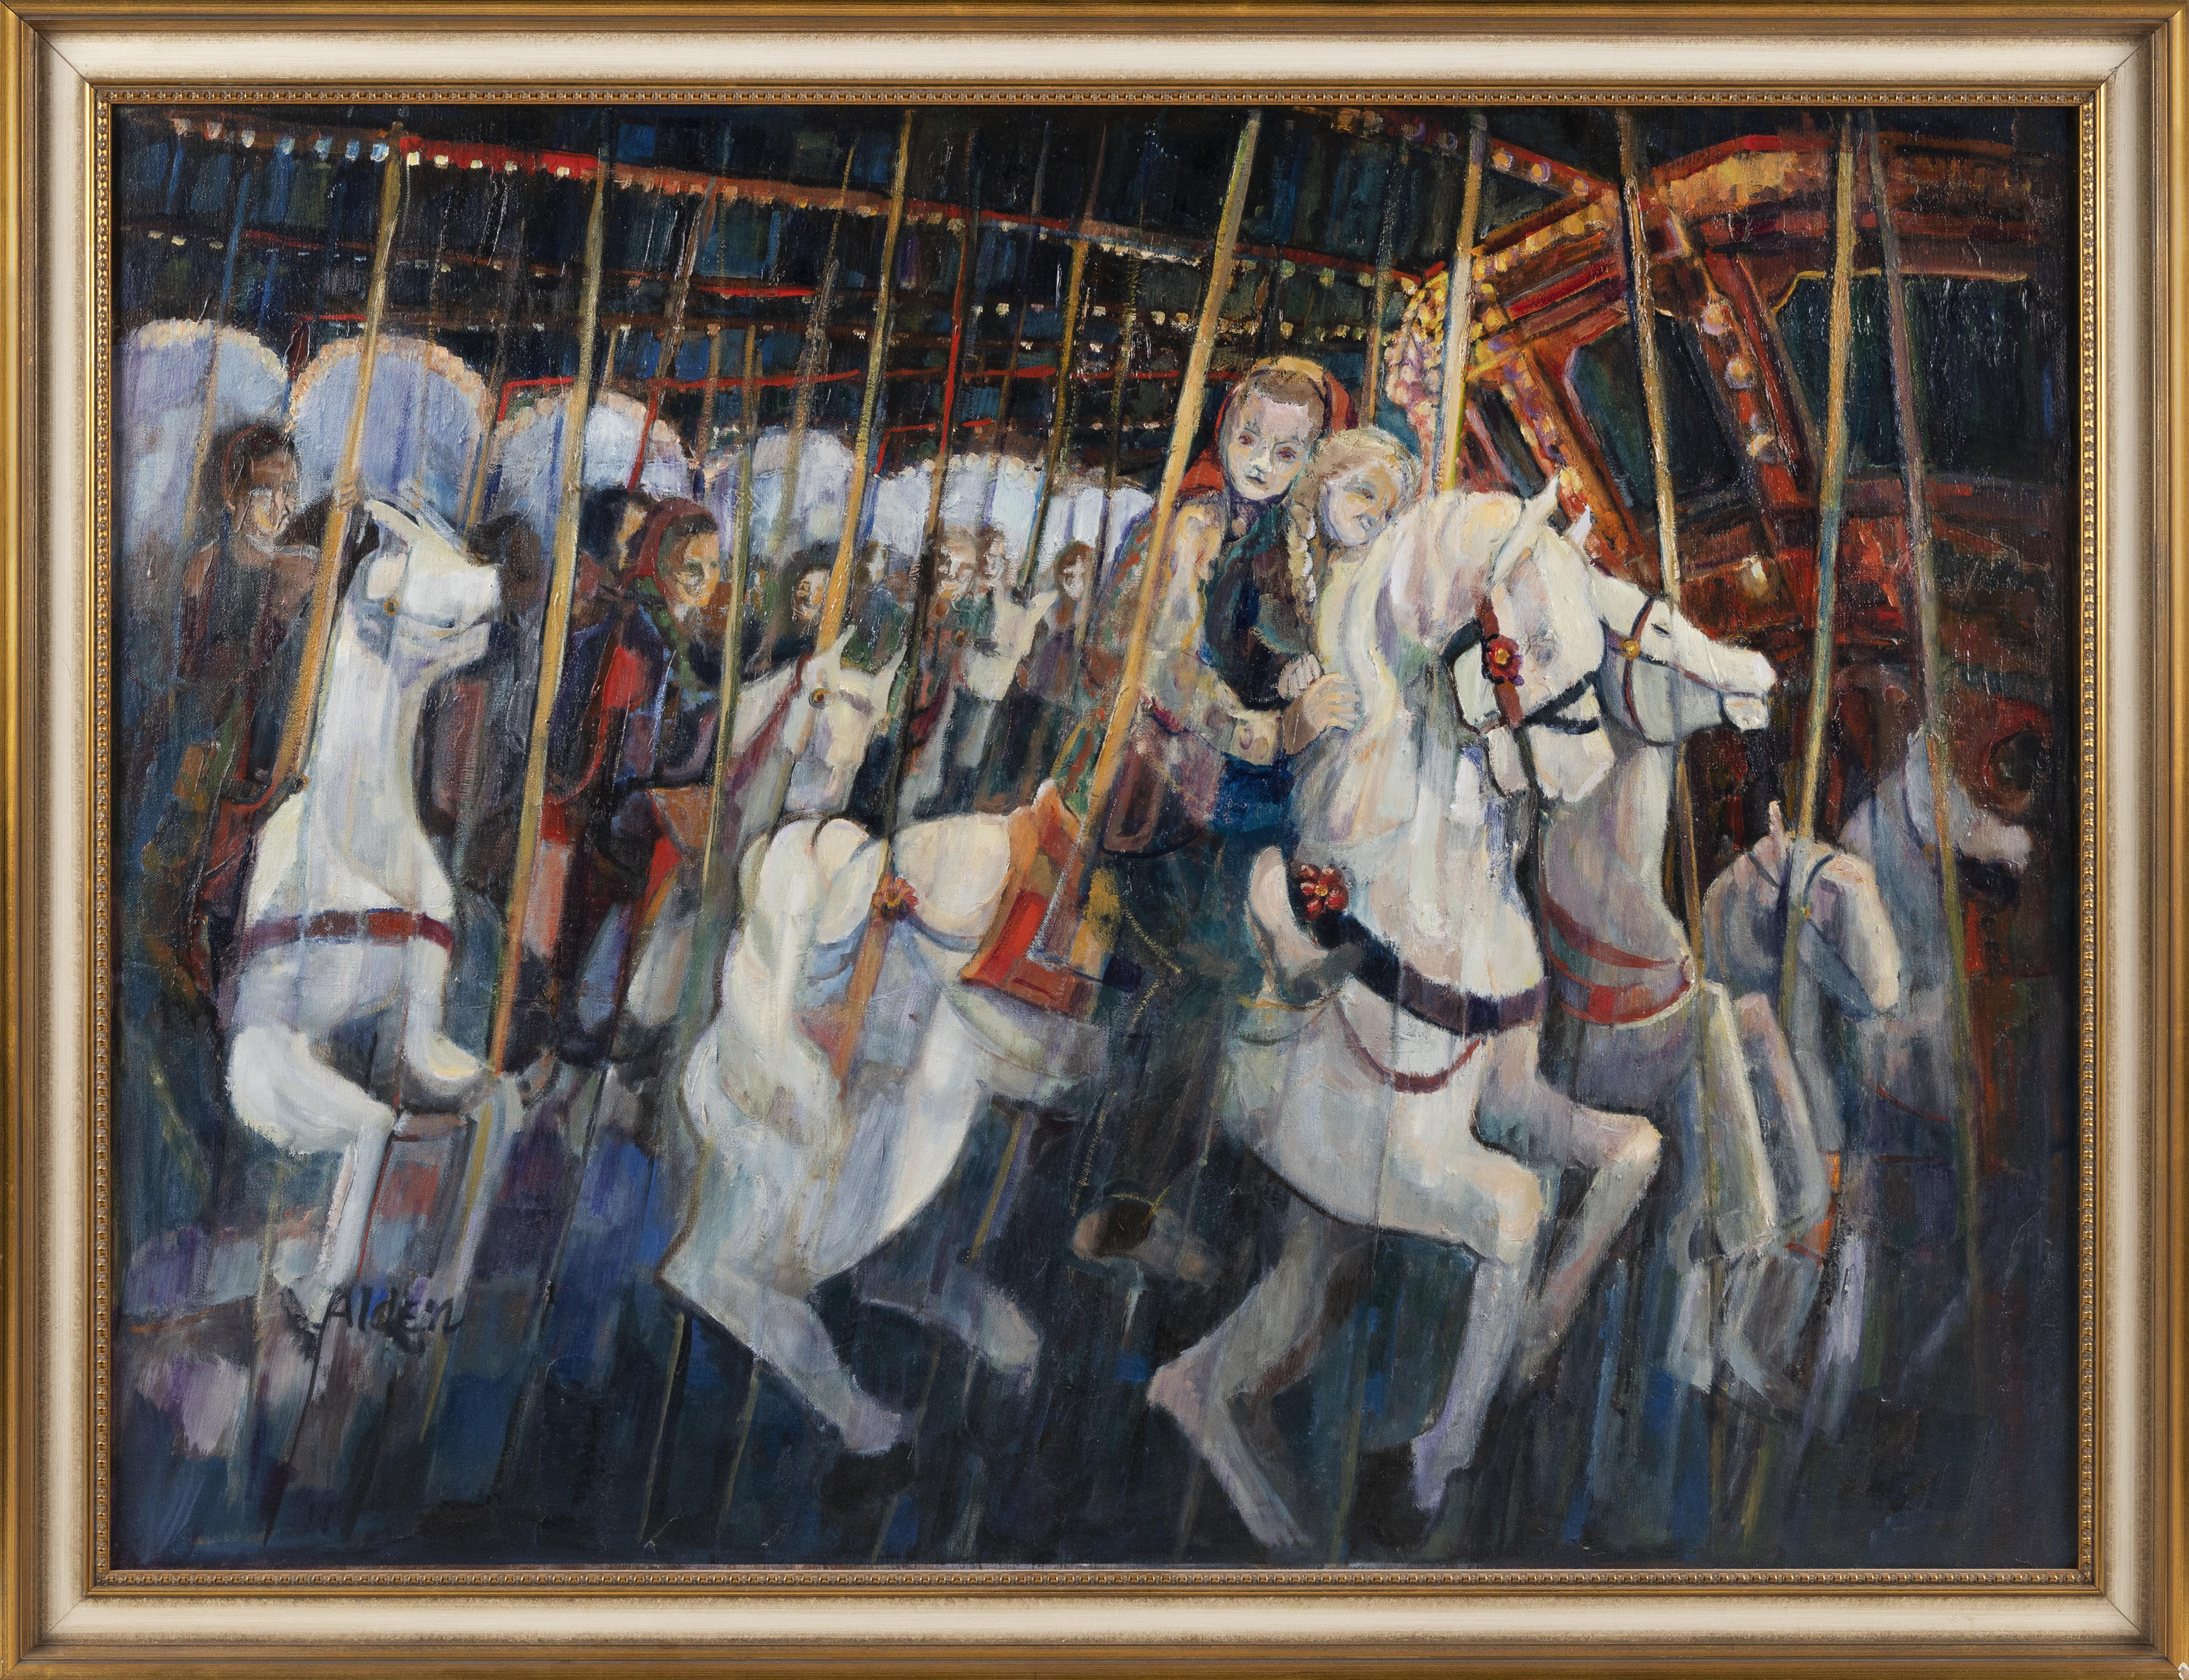 "SELMA ALDEN (Massachusetts, Contemporary), Figures on a carousel., Oil on canvas, 30"" x 40"". Framed 33.5"" x 43.5""."